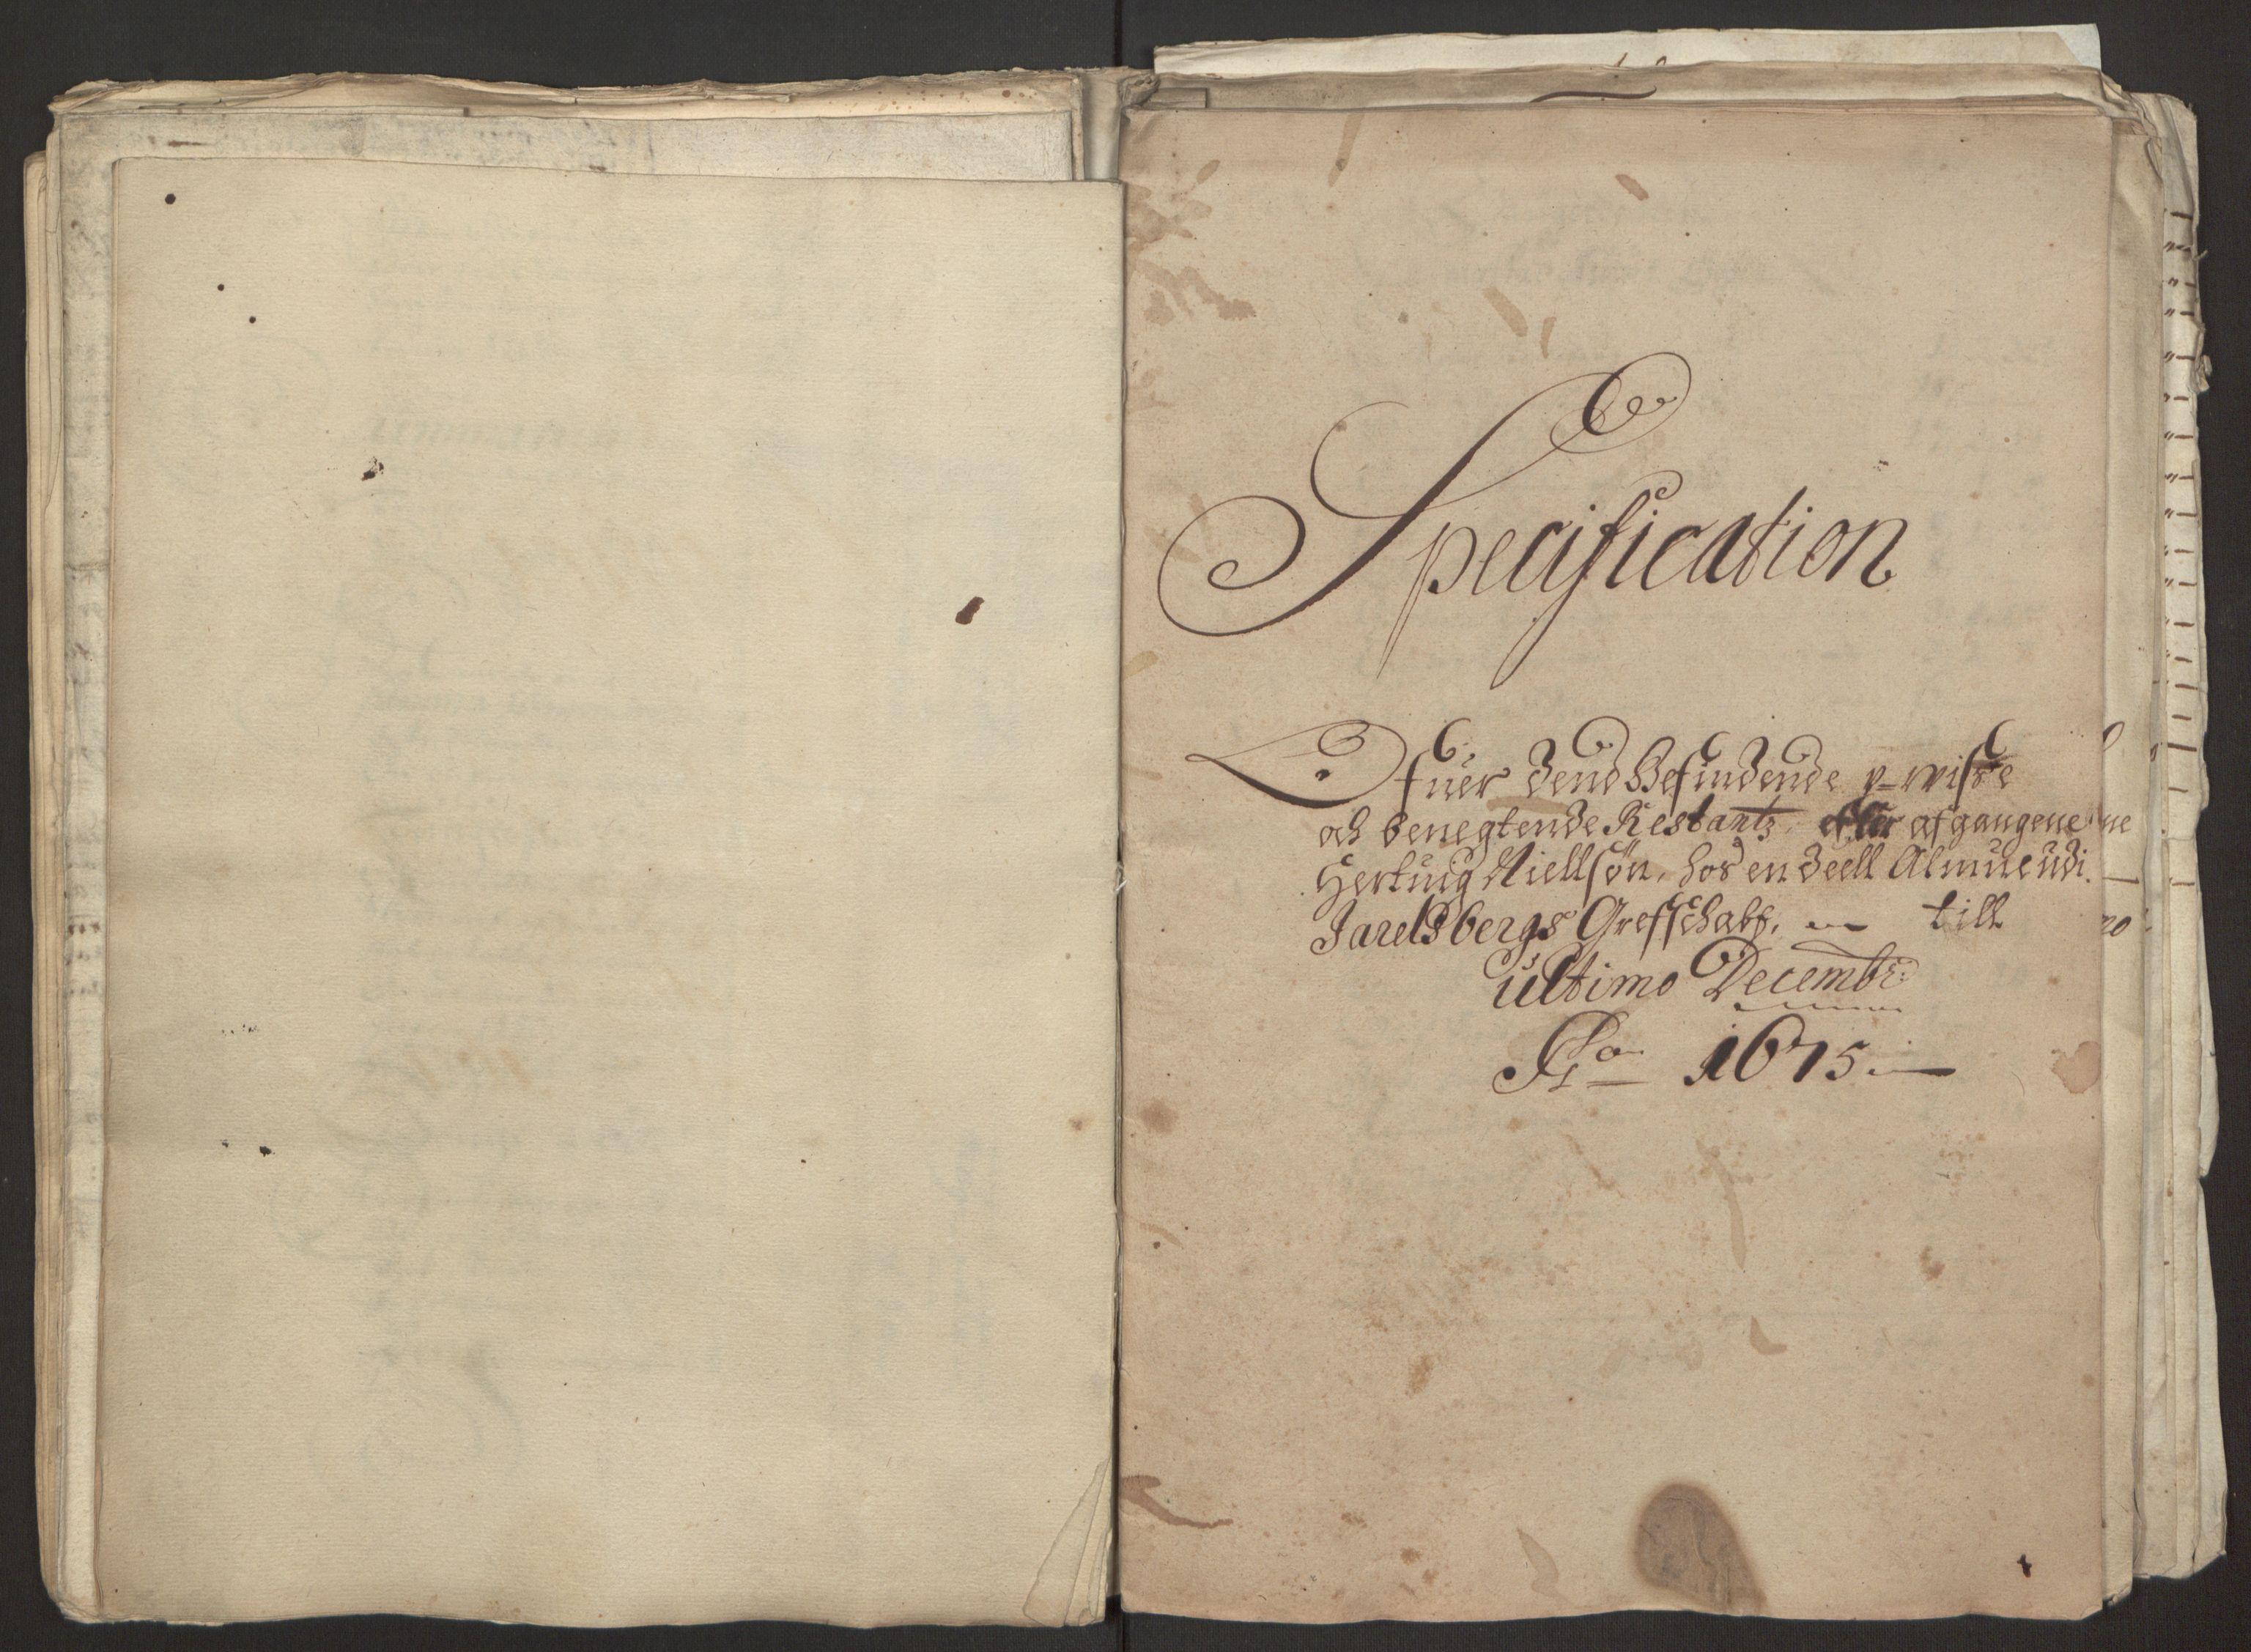 RA, Rentekammeret inntil 1814, Reviderte regnskaper, Fogderegnskap, R32/L1843: Fogderegnskap Jarlsberg grevskap, 1674-1675, s. 45